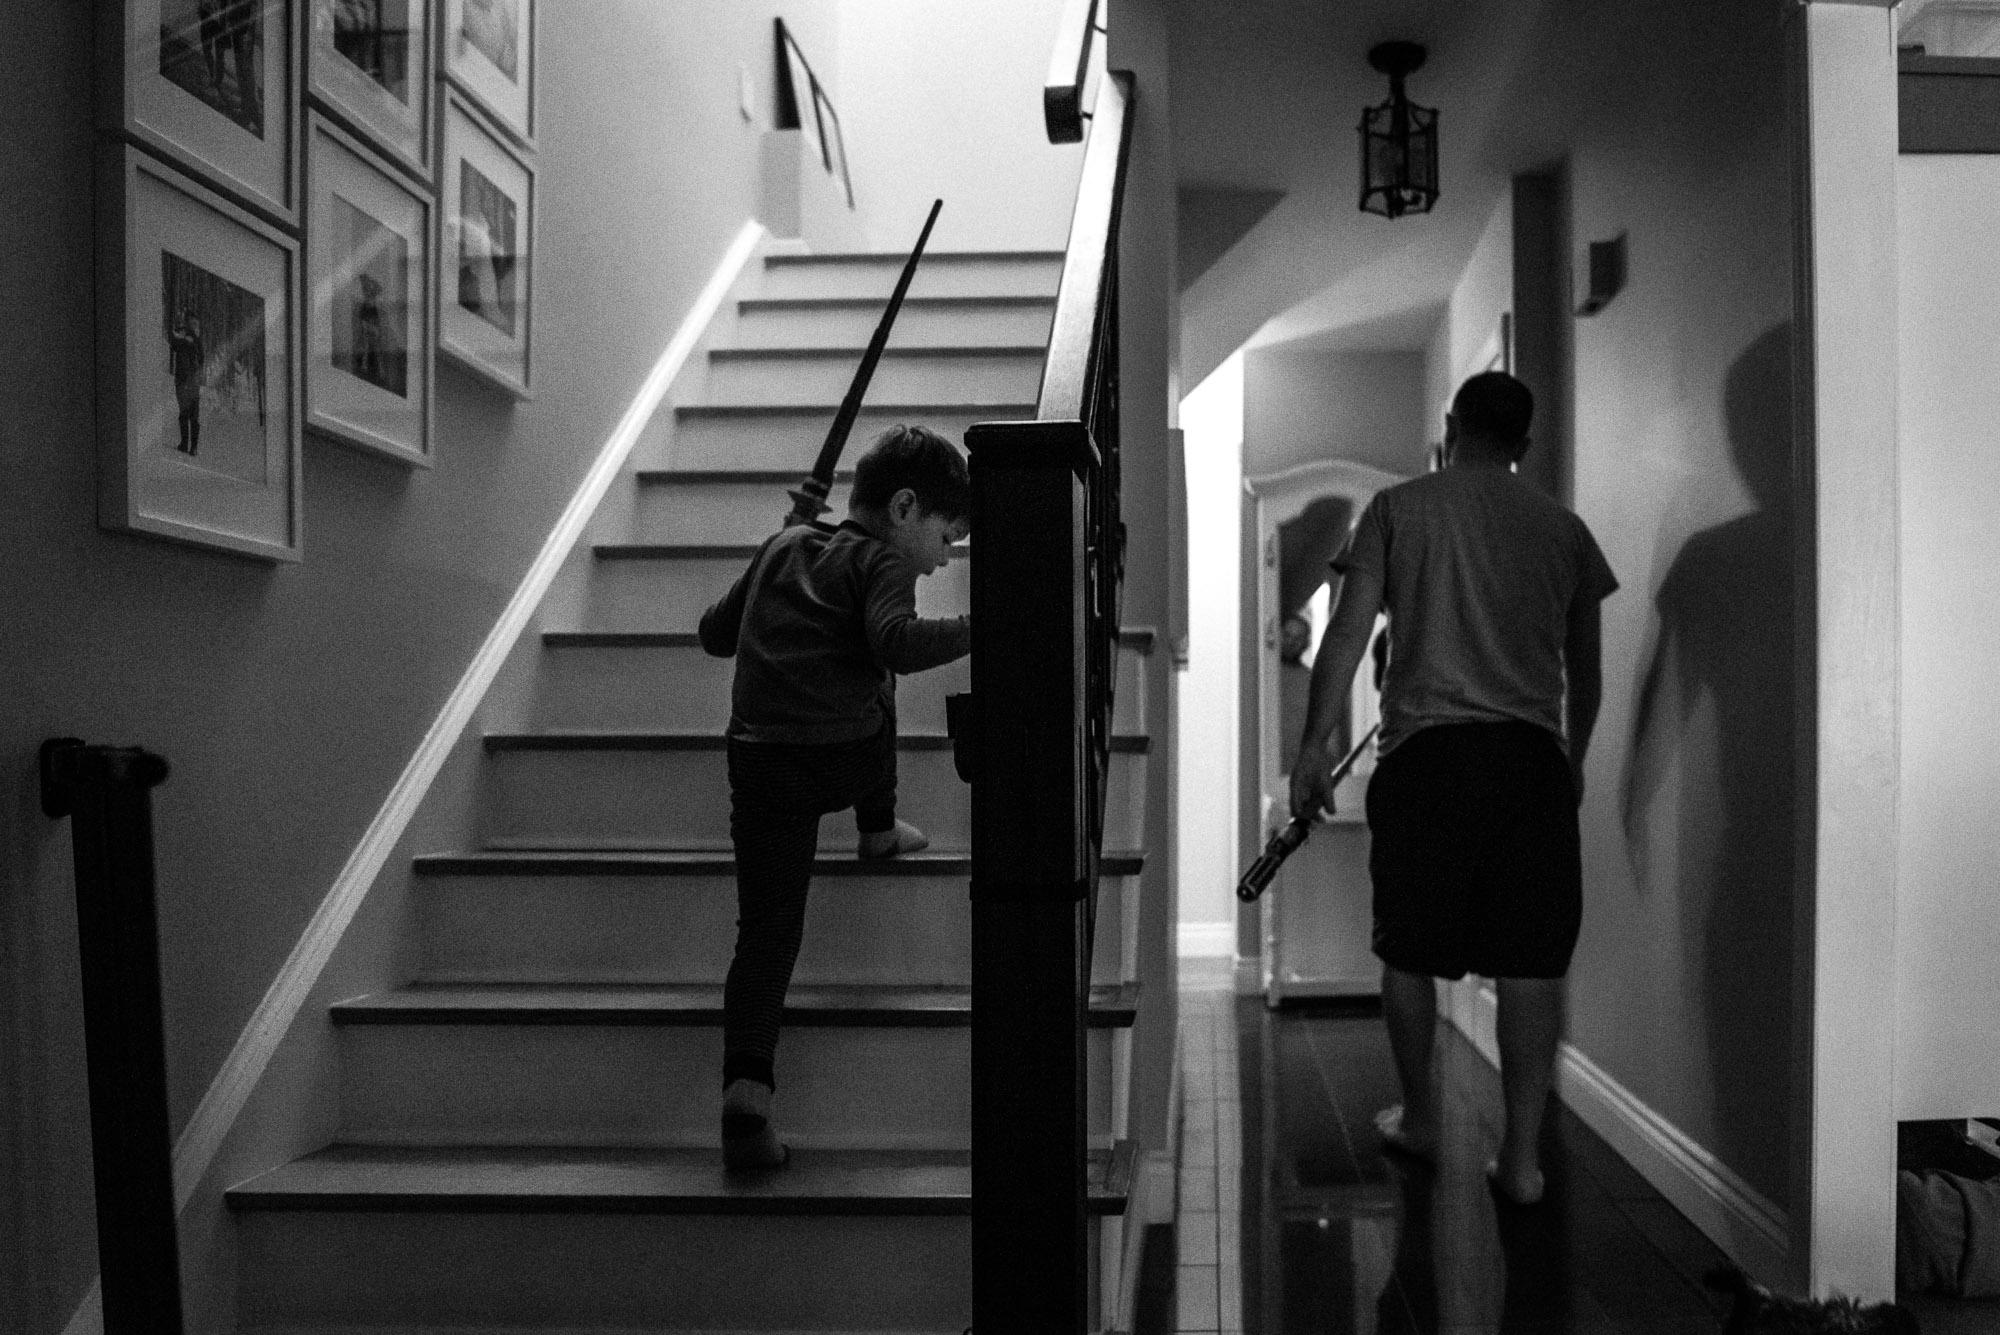 boy climbs the stairs as dad walks away